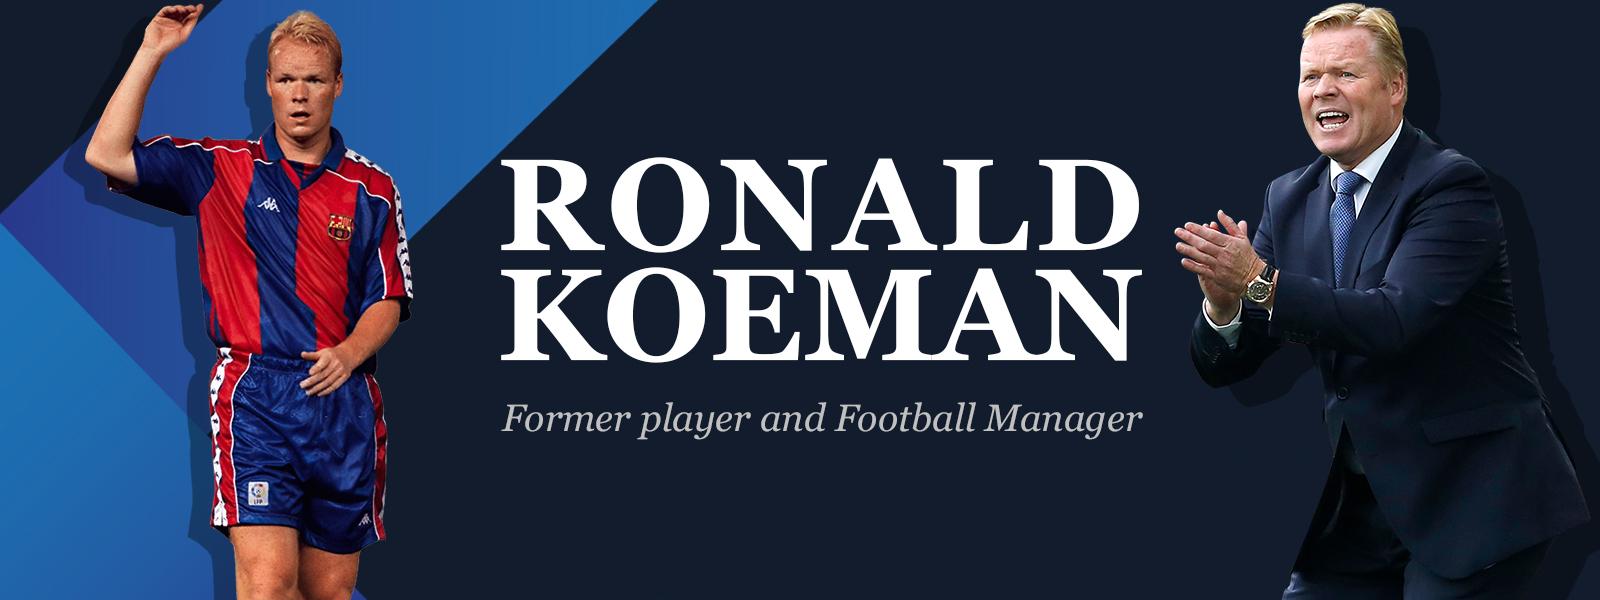 Dutch Football Manager Ronald Koeman